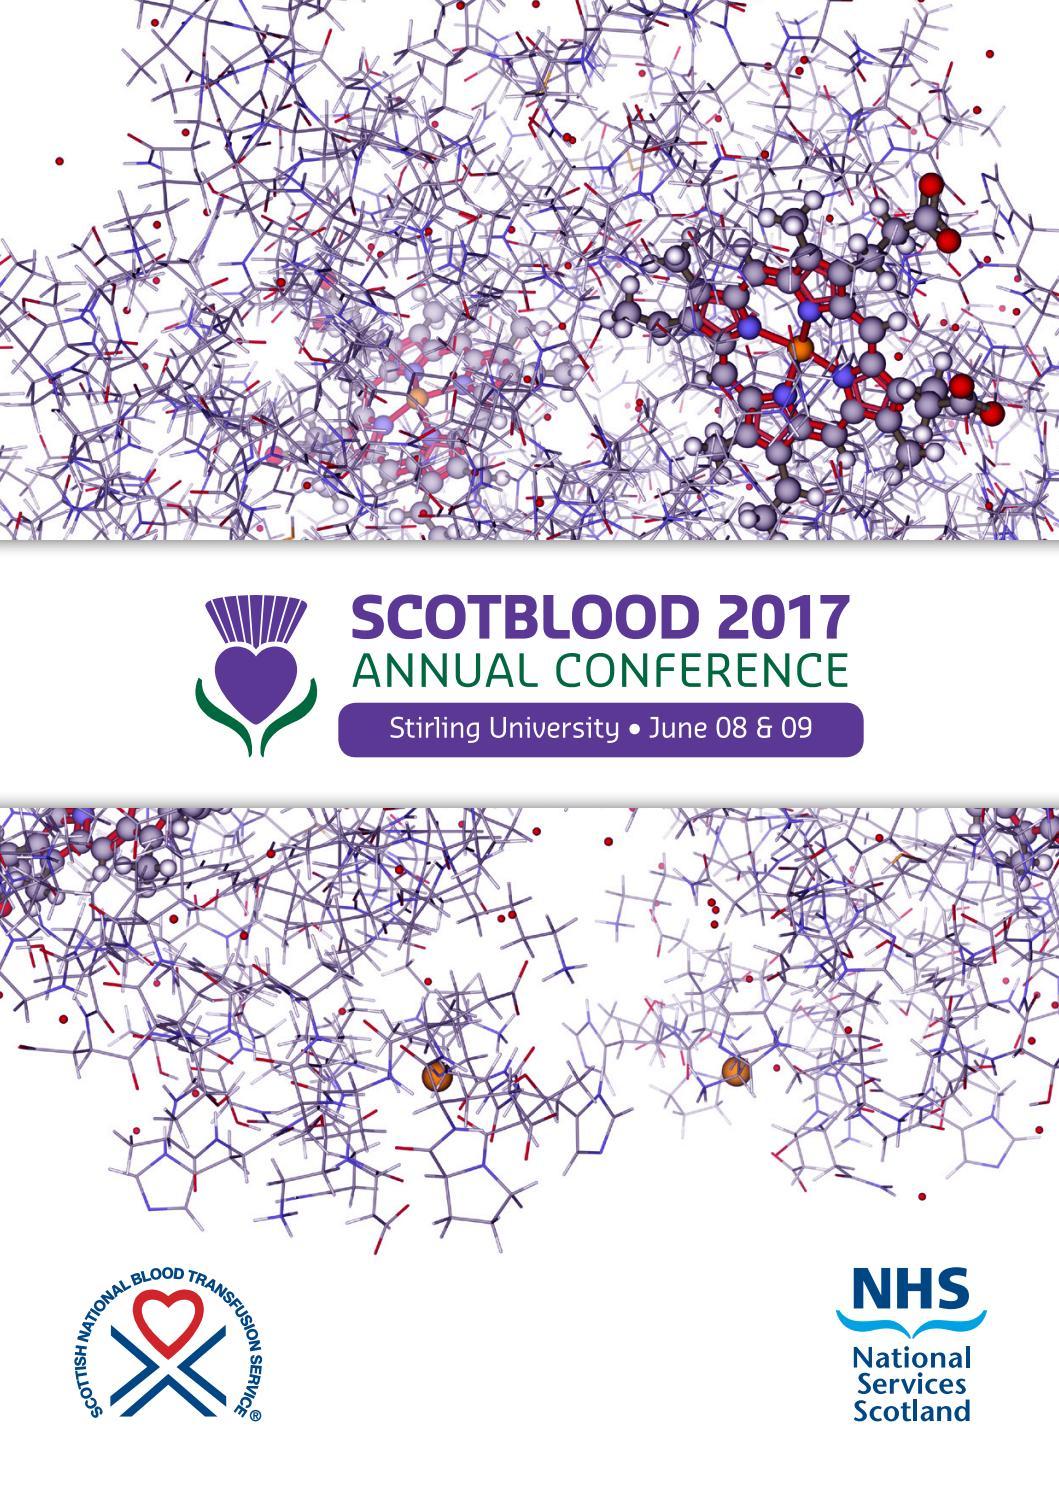 Scotblood 2017 by Gareth Neil Design - issuu